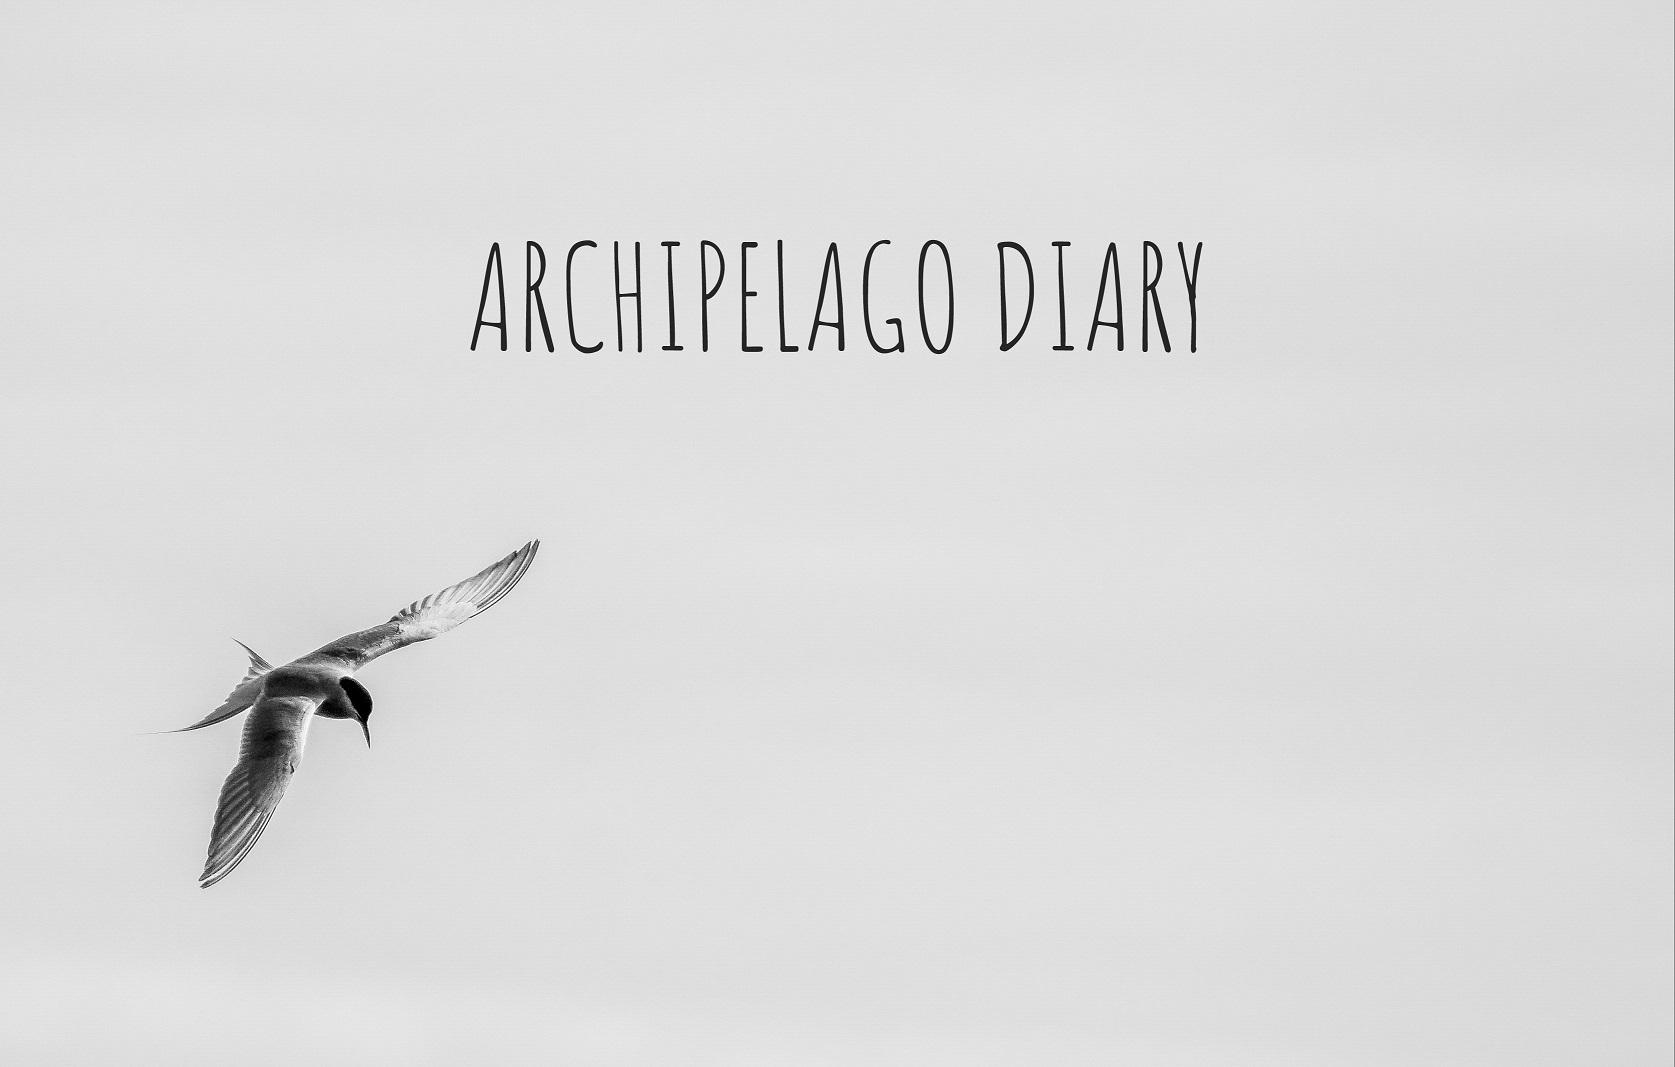 Archipelago Diary